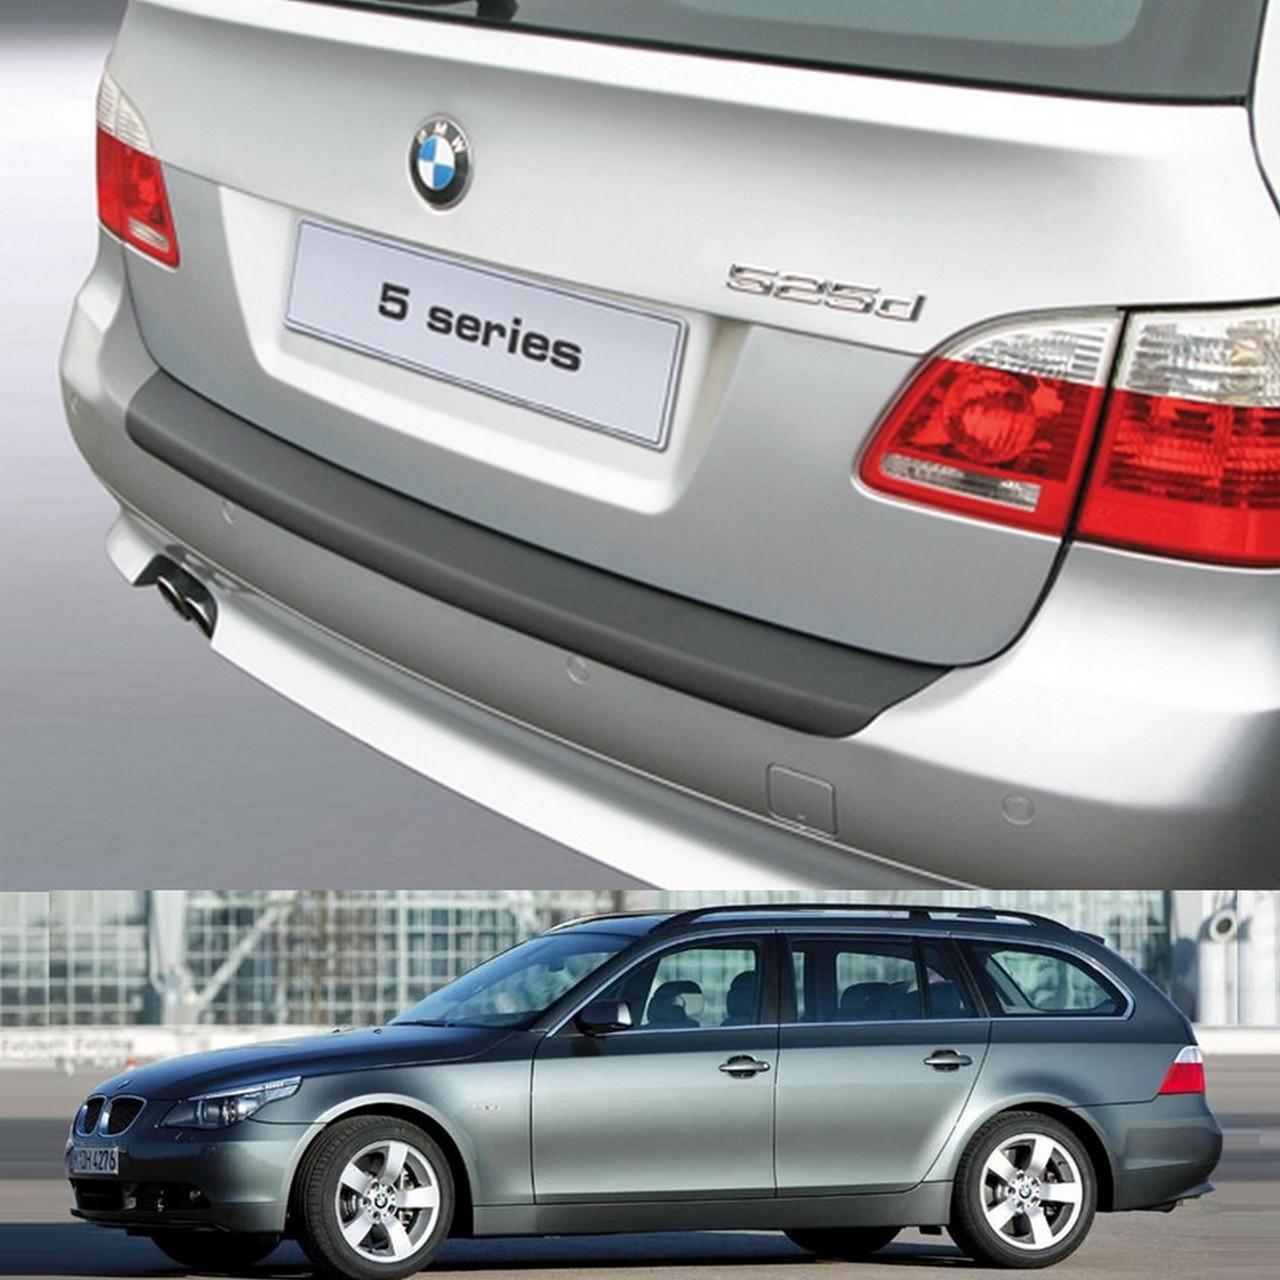 BMW 5-series E61 Touring 2004-2010 пластиковая накладка заднего бампера